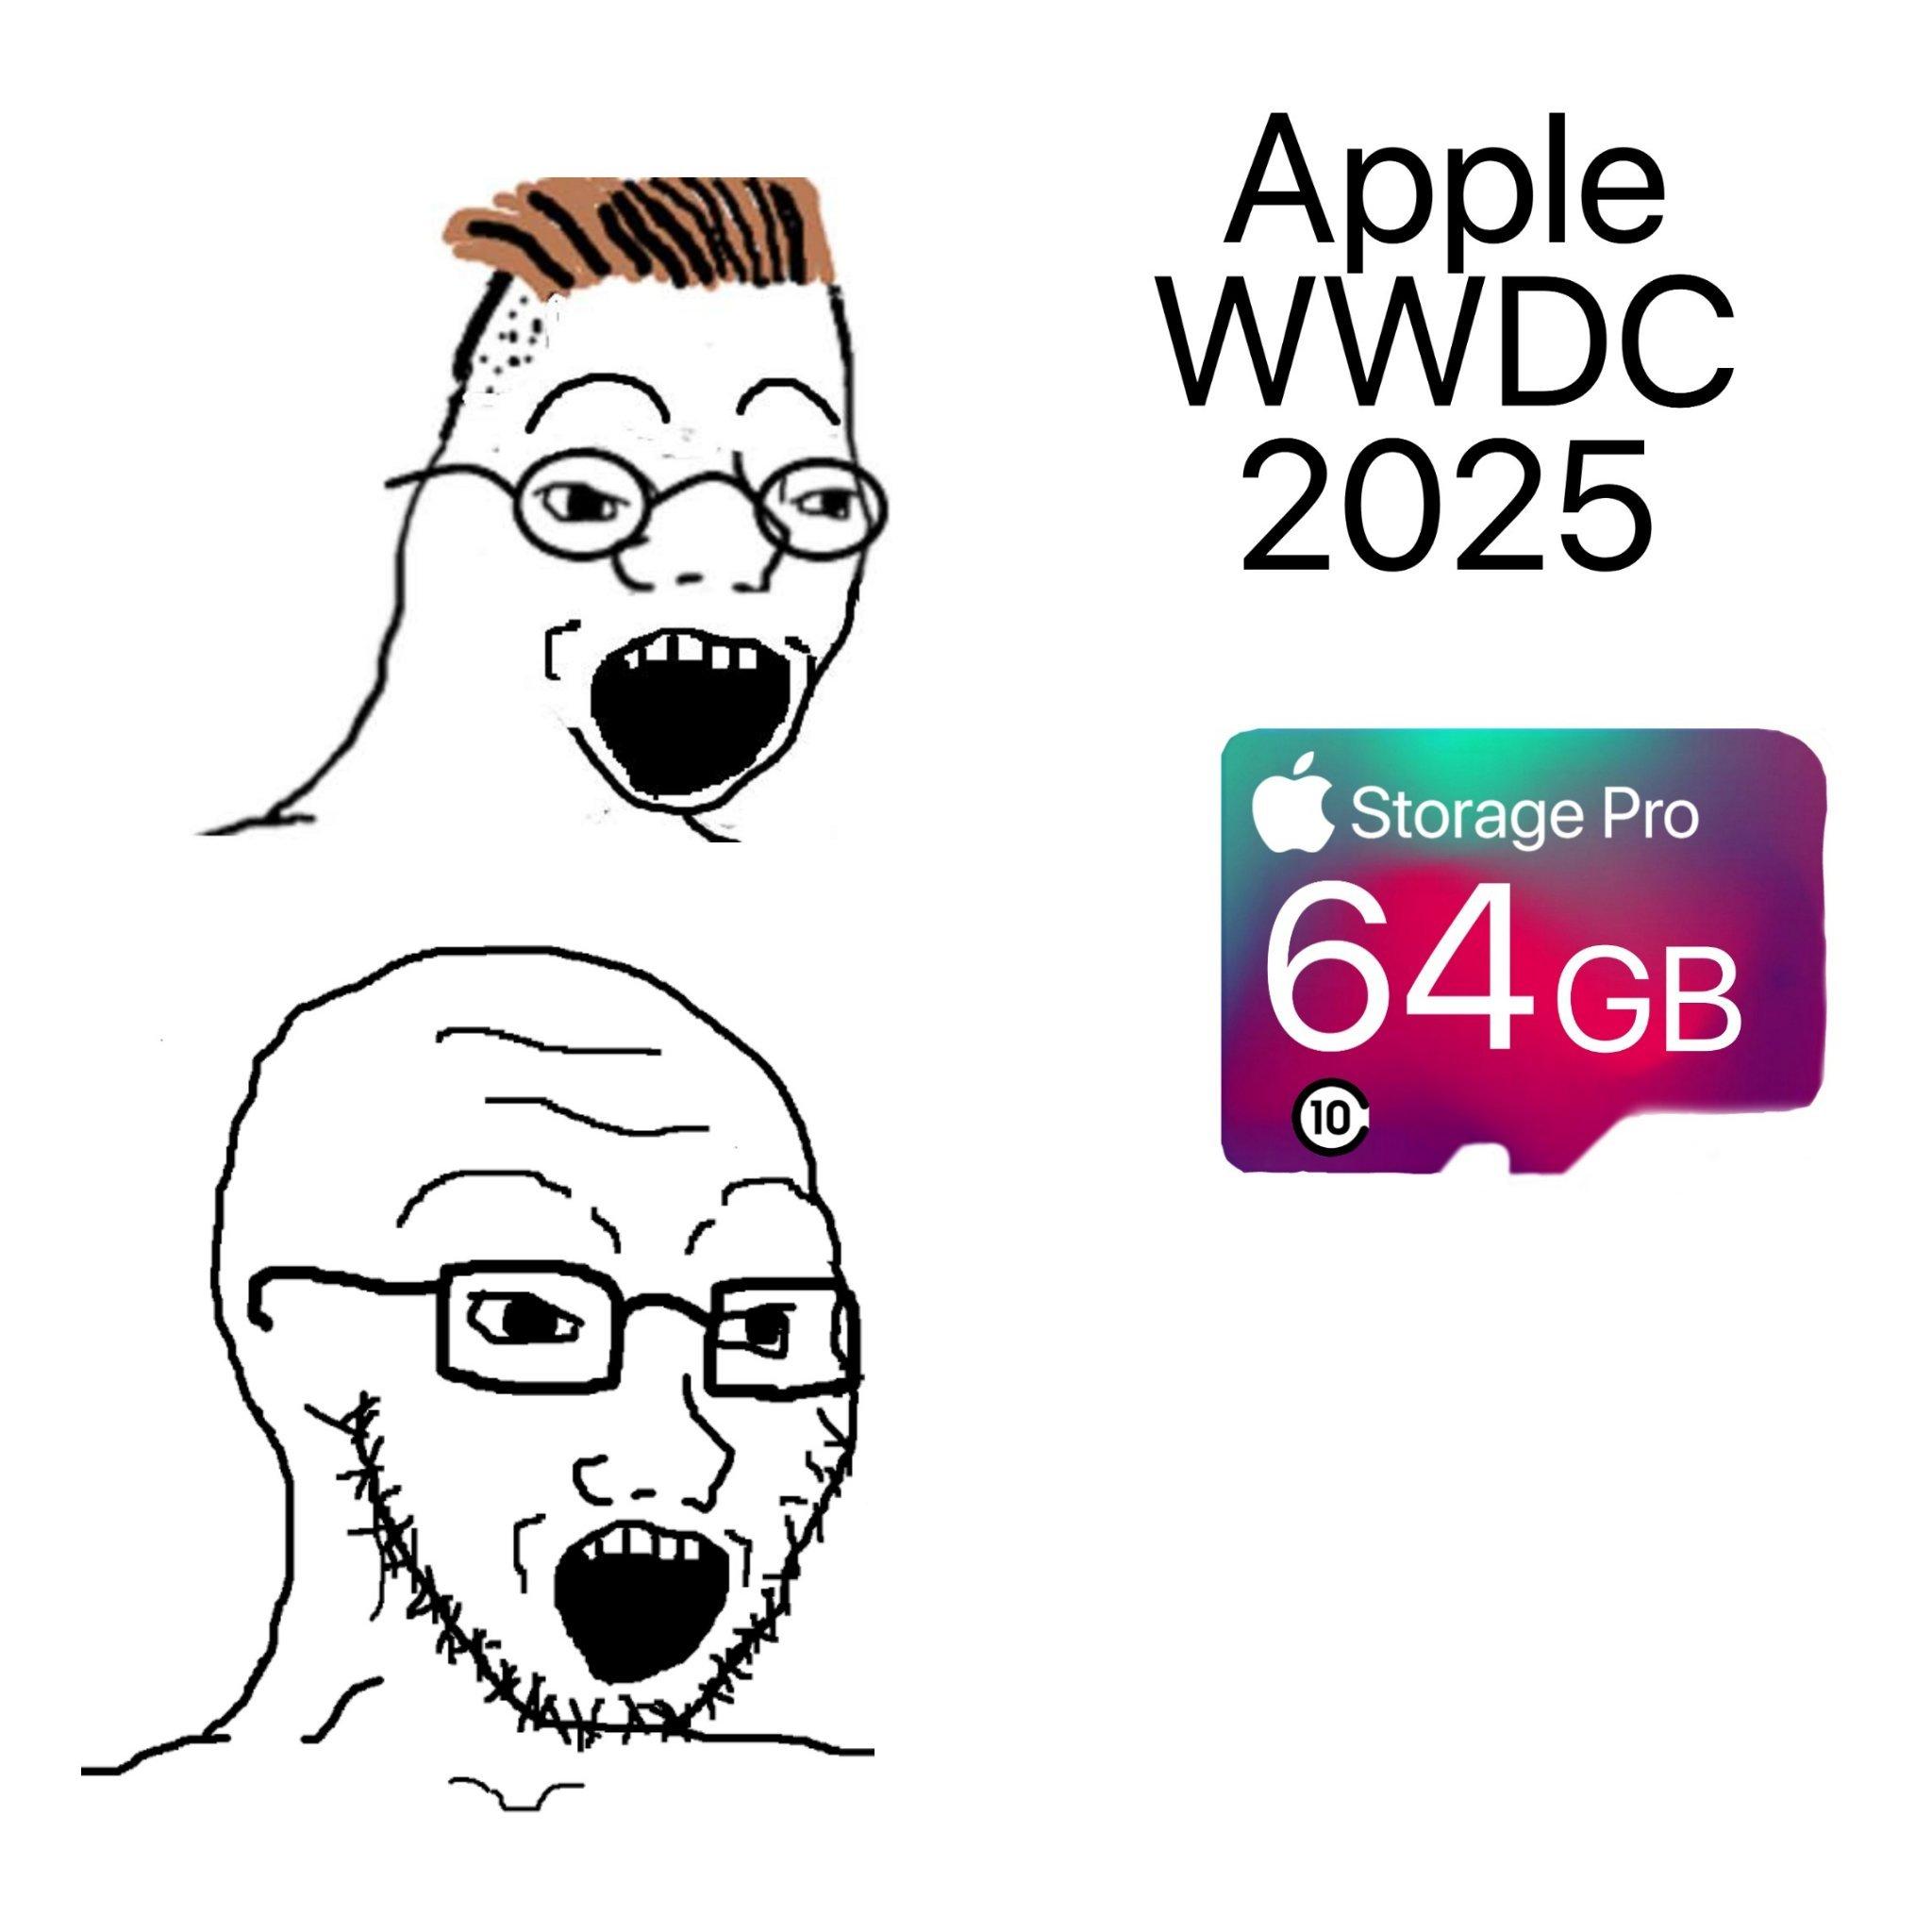 Apple fanboys en una imagen - meme